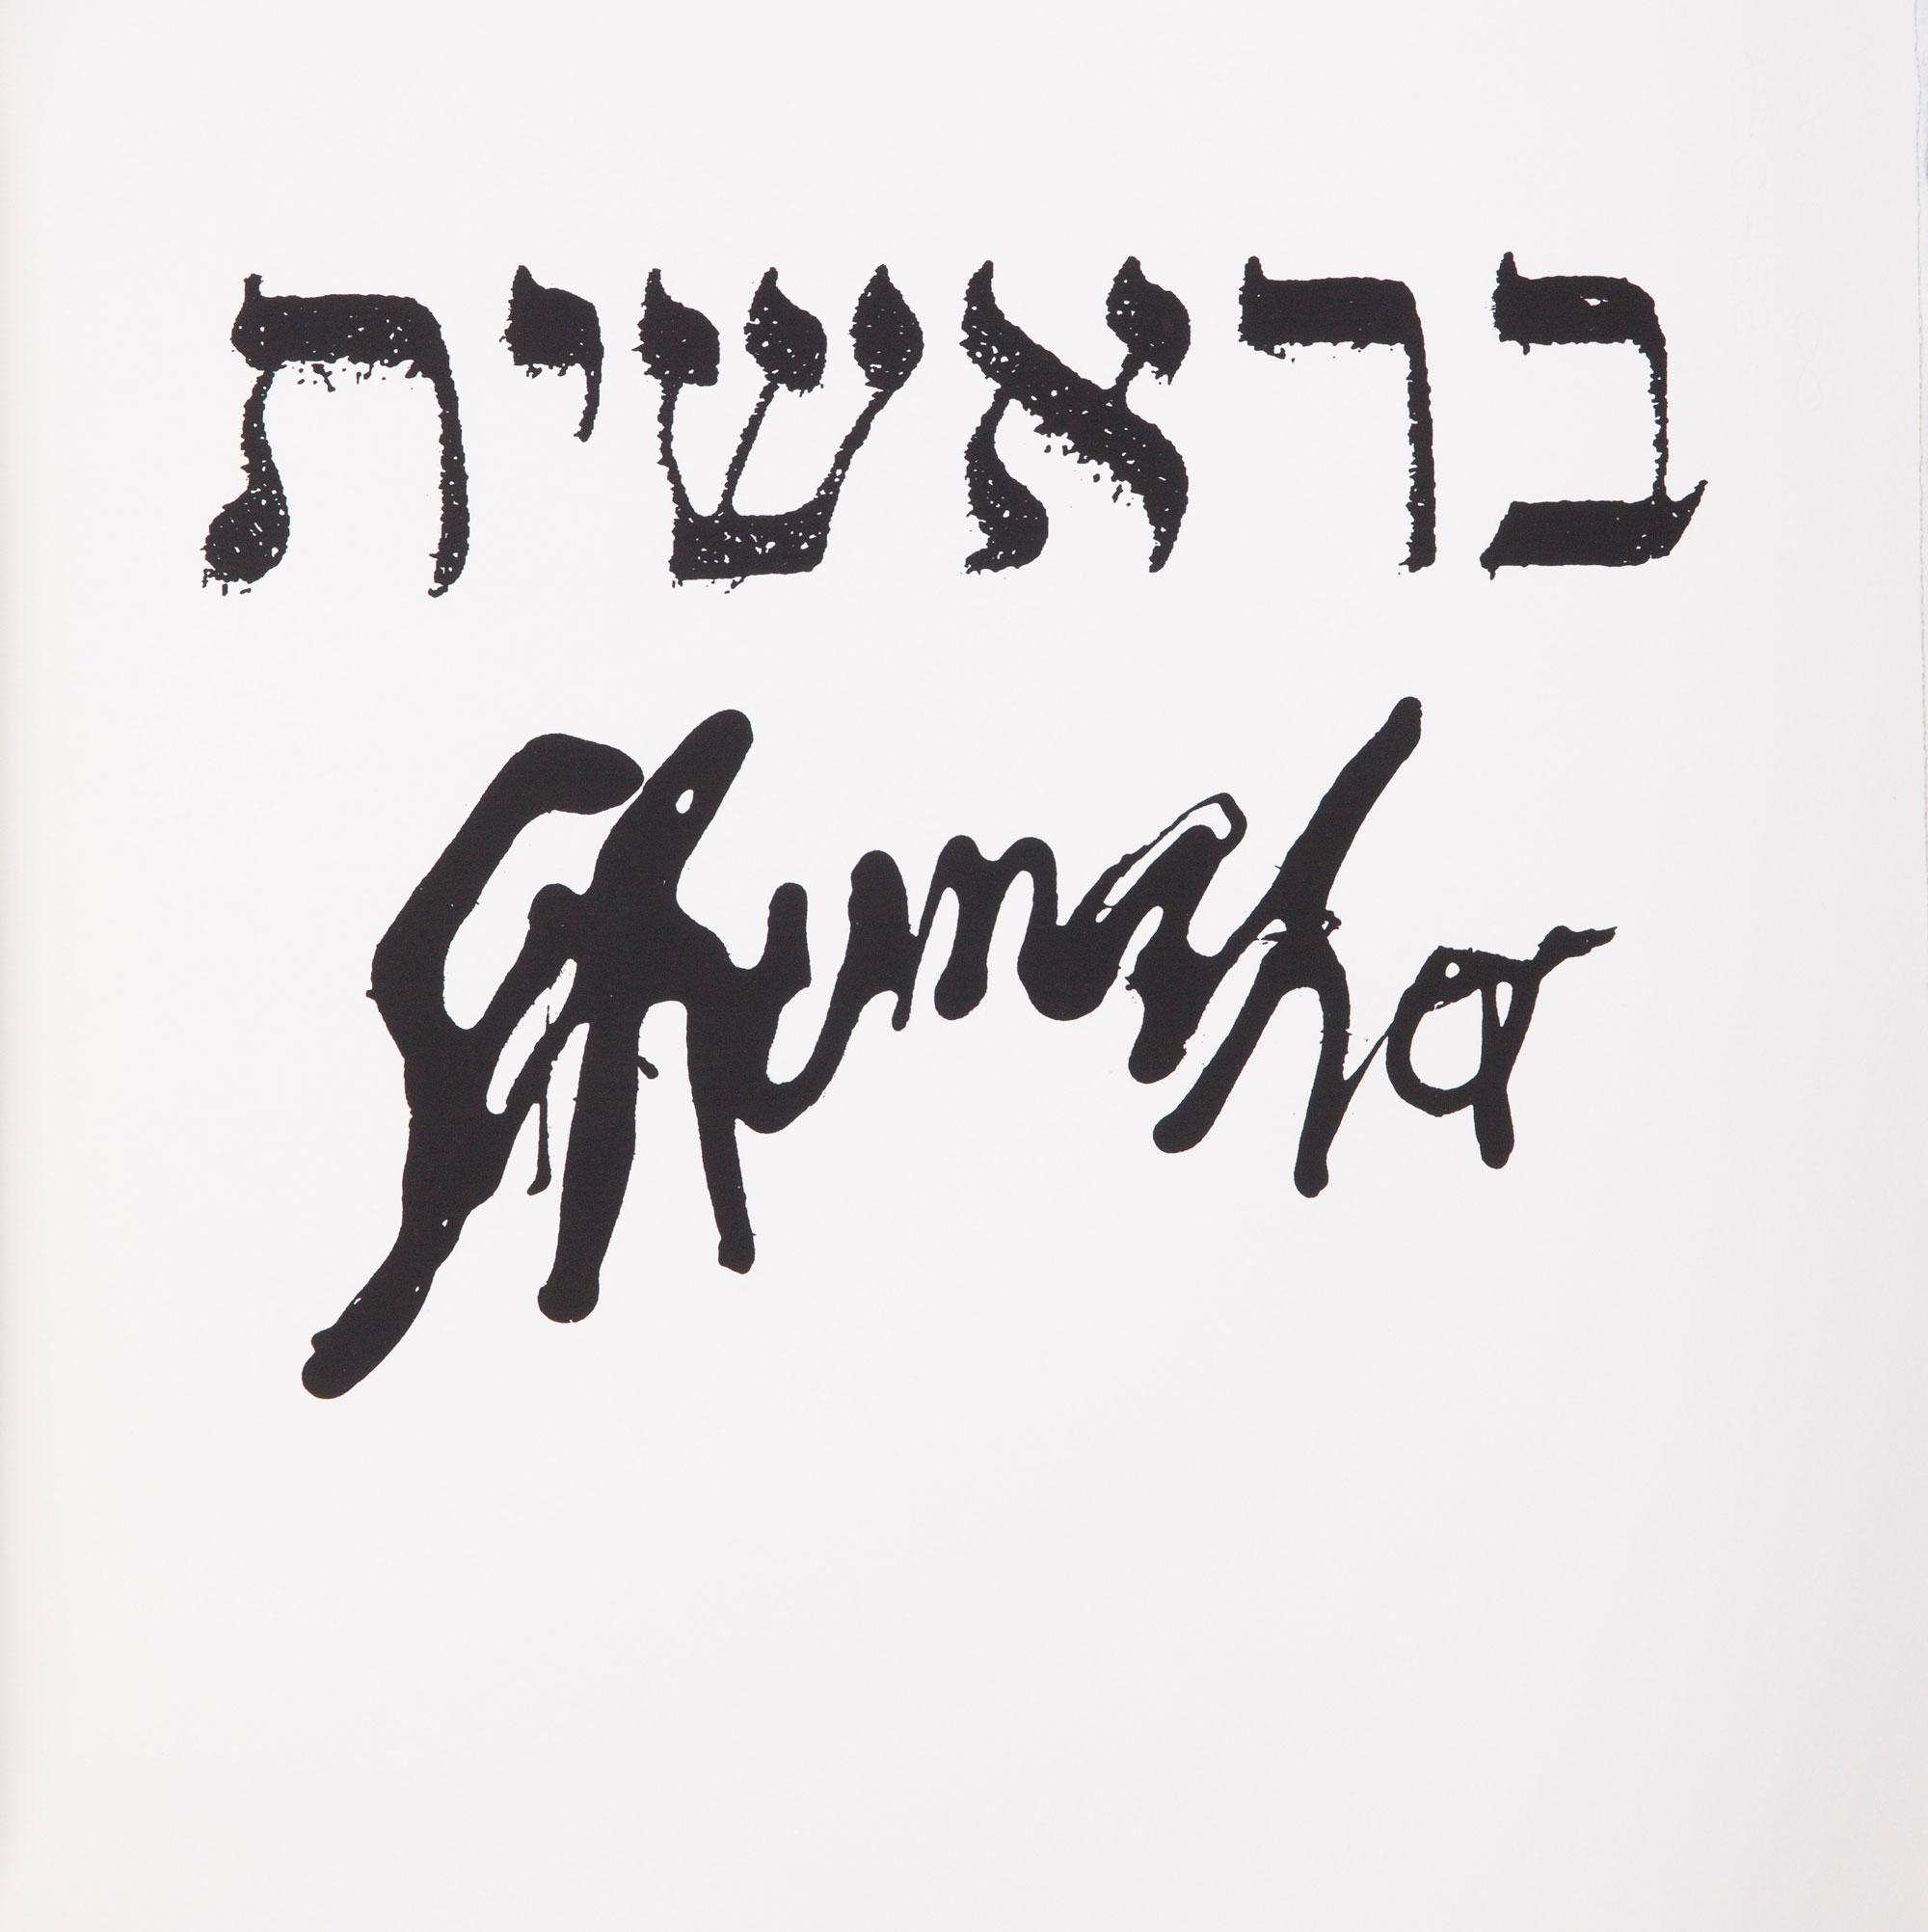 Emil Schumacher Grafik, Genesis Titelblatt, 1999